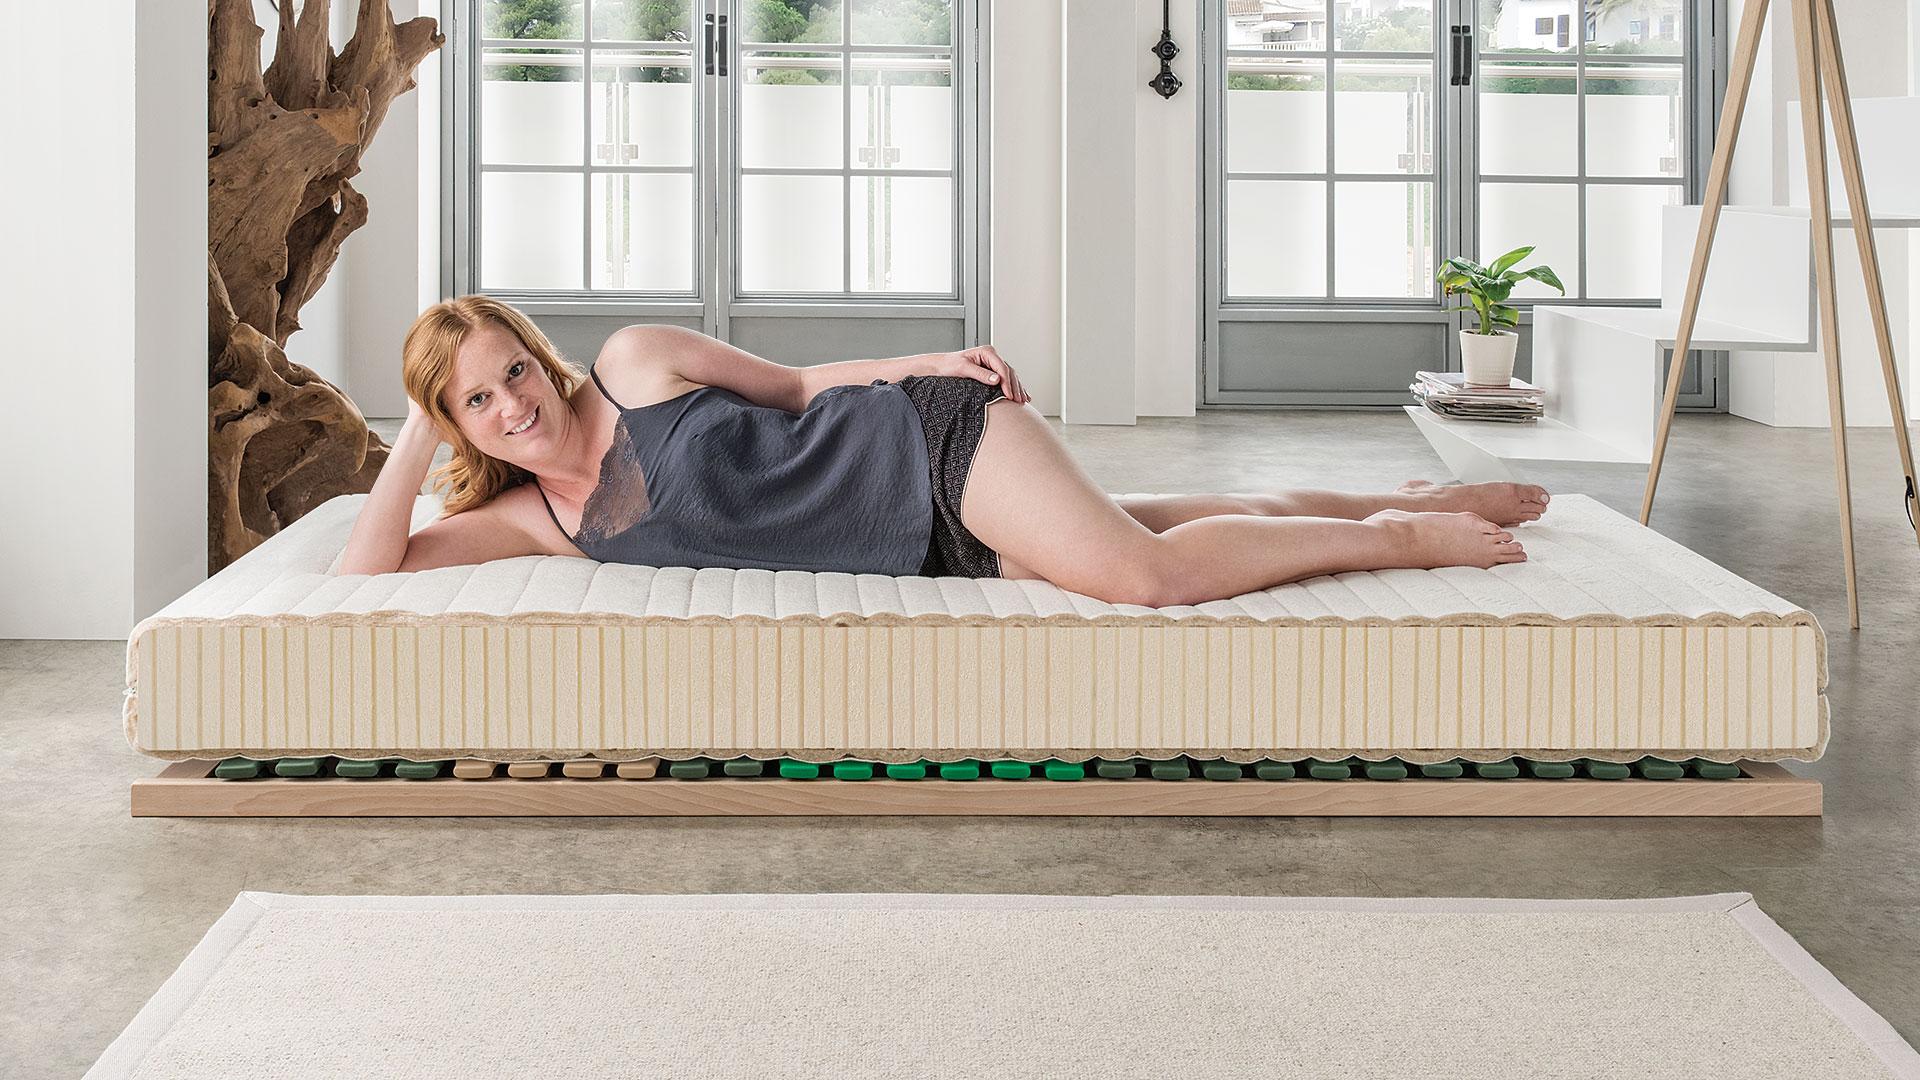 naturlatex matratze sana optima. Black Bedroom Furniture Sets. Home Design Ideas